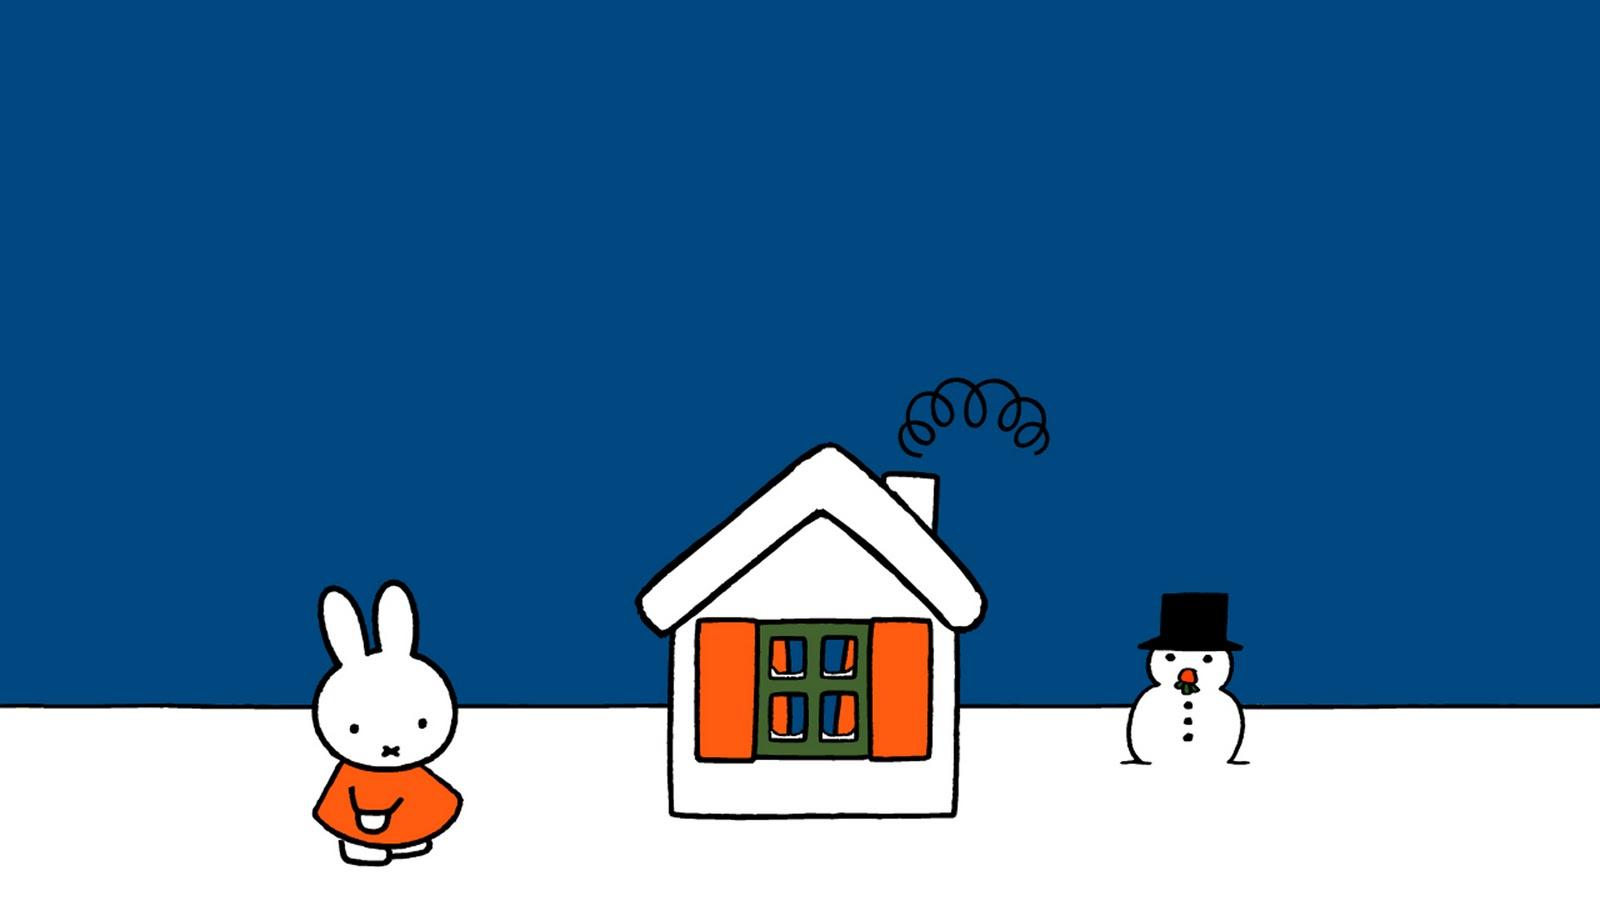 Miffy ǵ�圖 Ž�片 ǚ�最新詳盡資料 ſ�看 Www Go2tutor Com